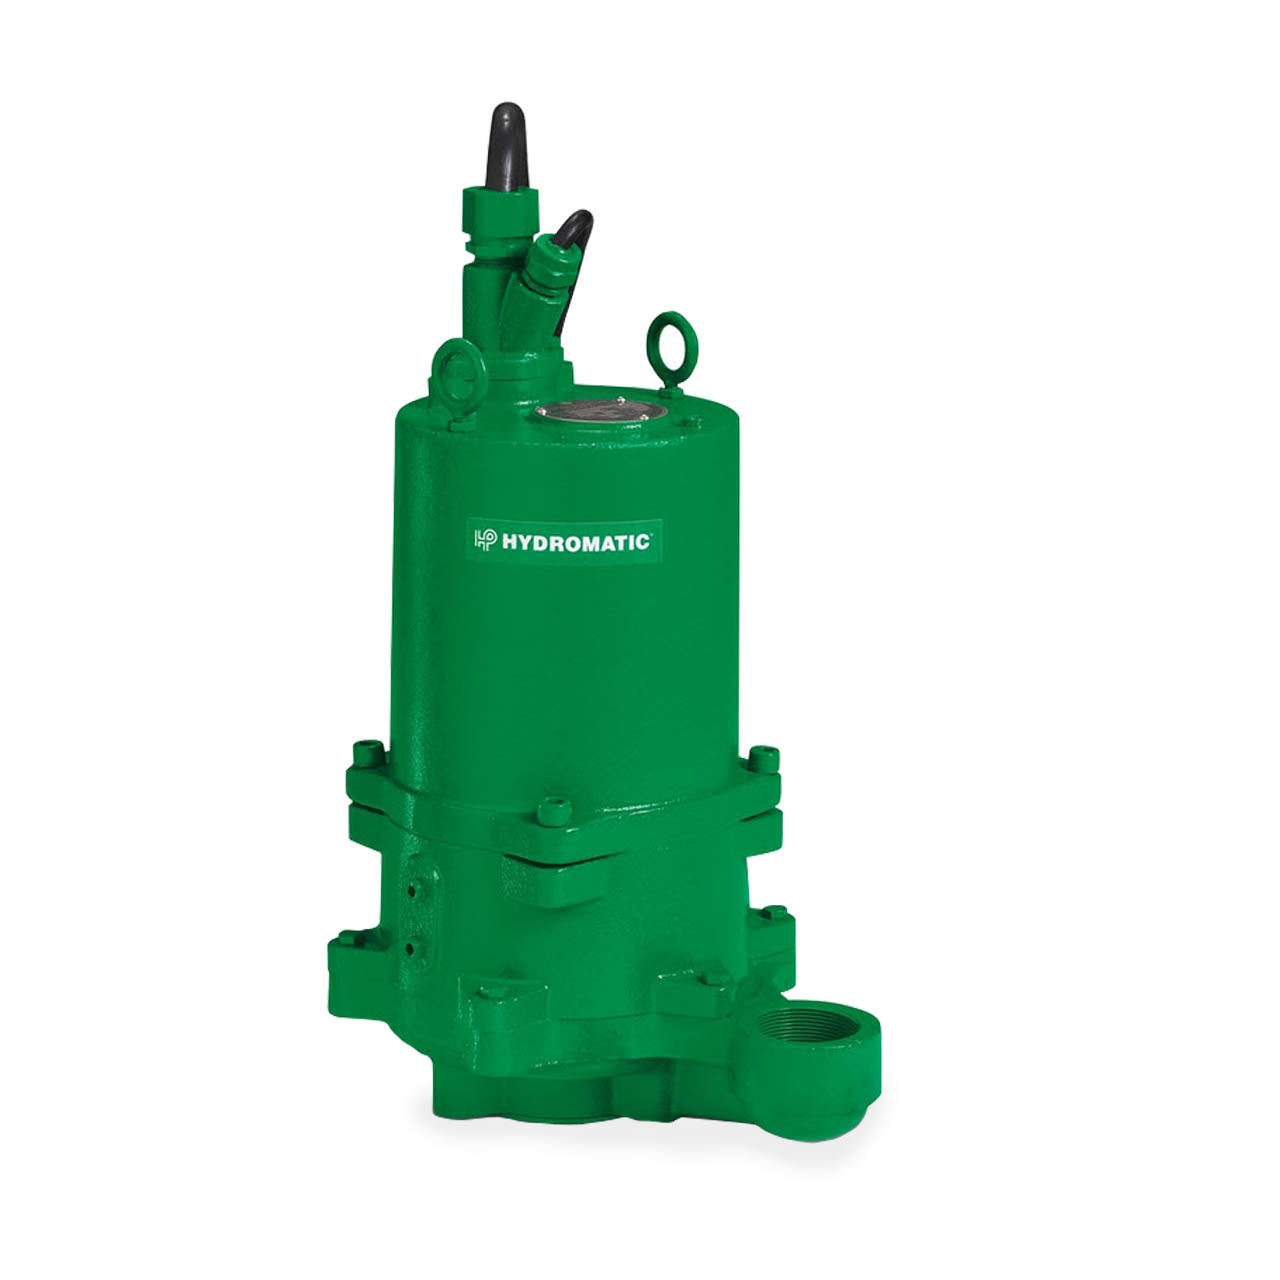 Hydromatic Pump Hydromatic Hpgh750m3 2 Sumbersible